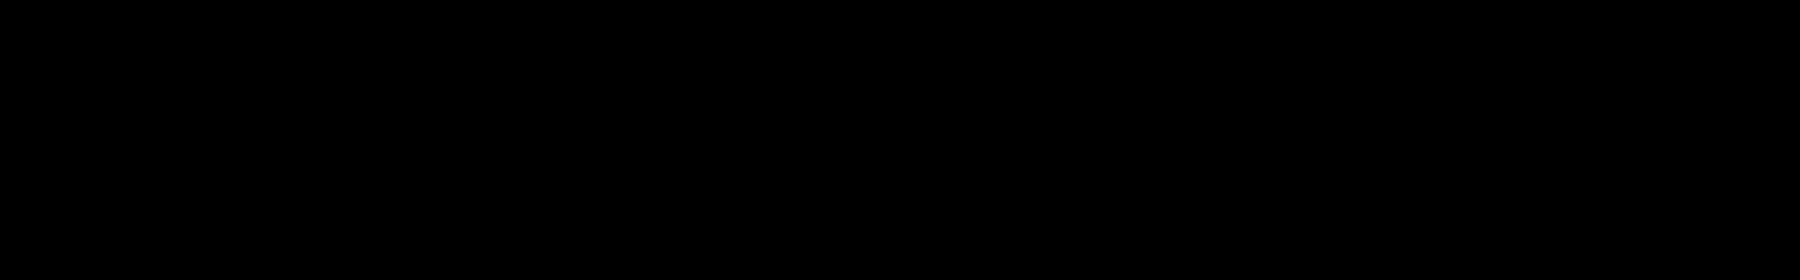 Tribalton by Basement Freaks audio waveform